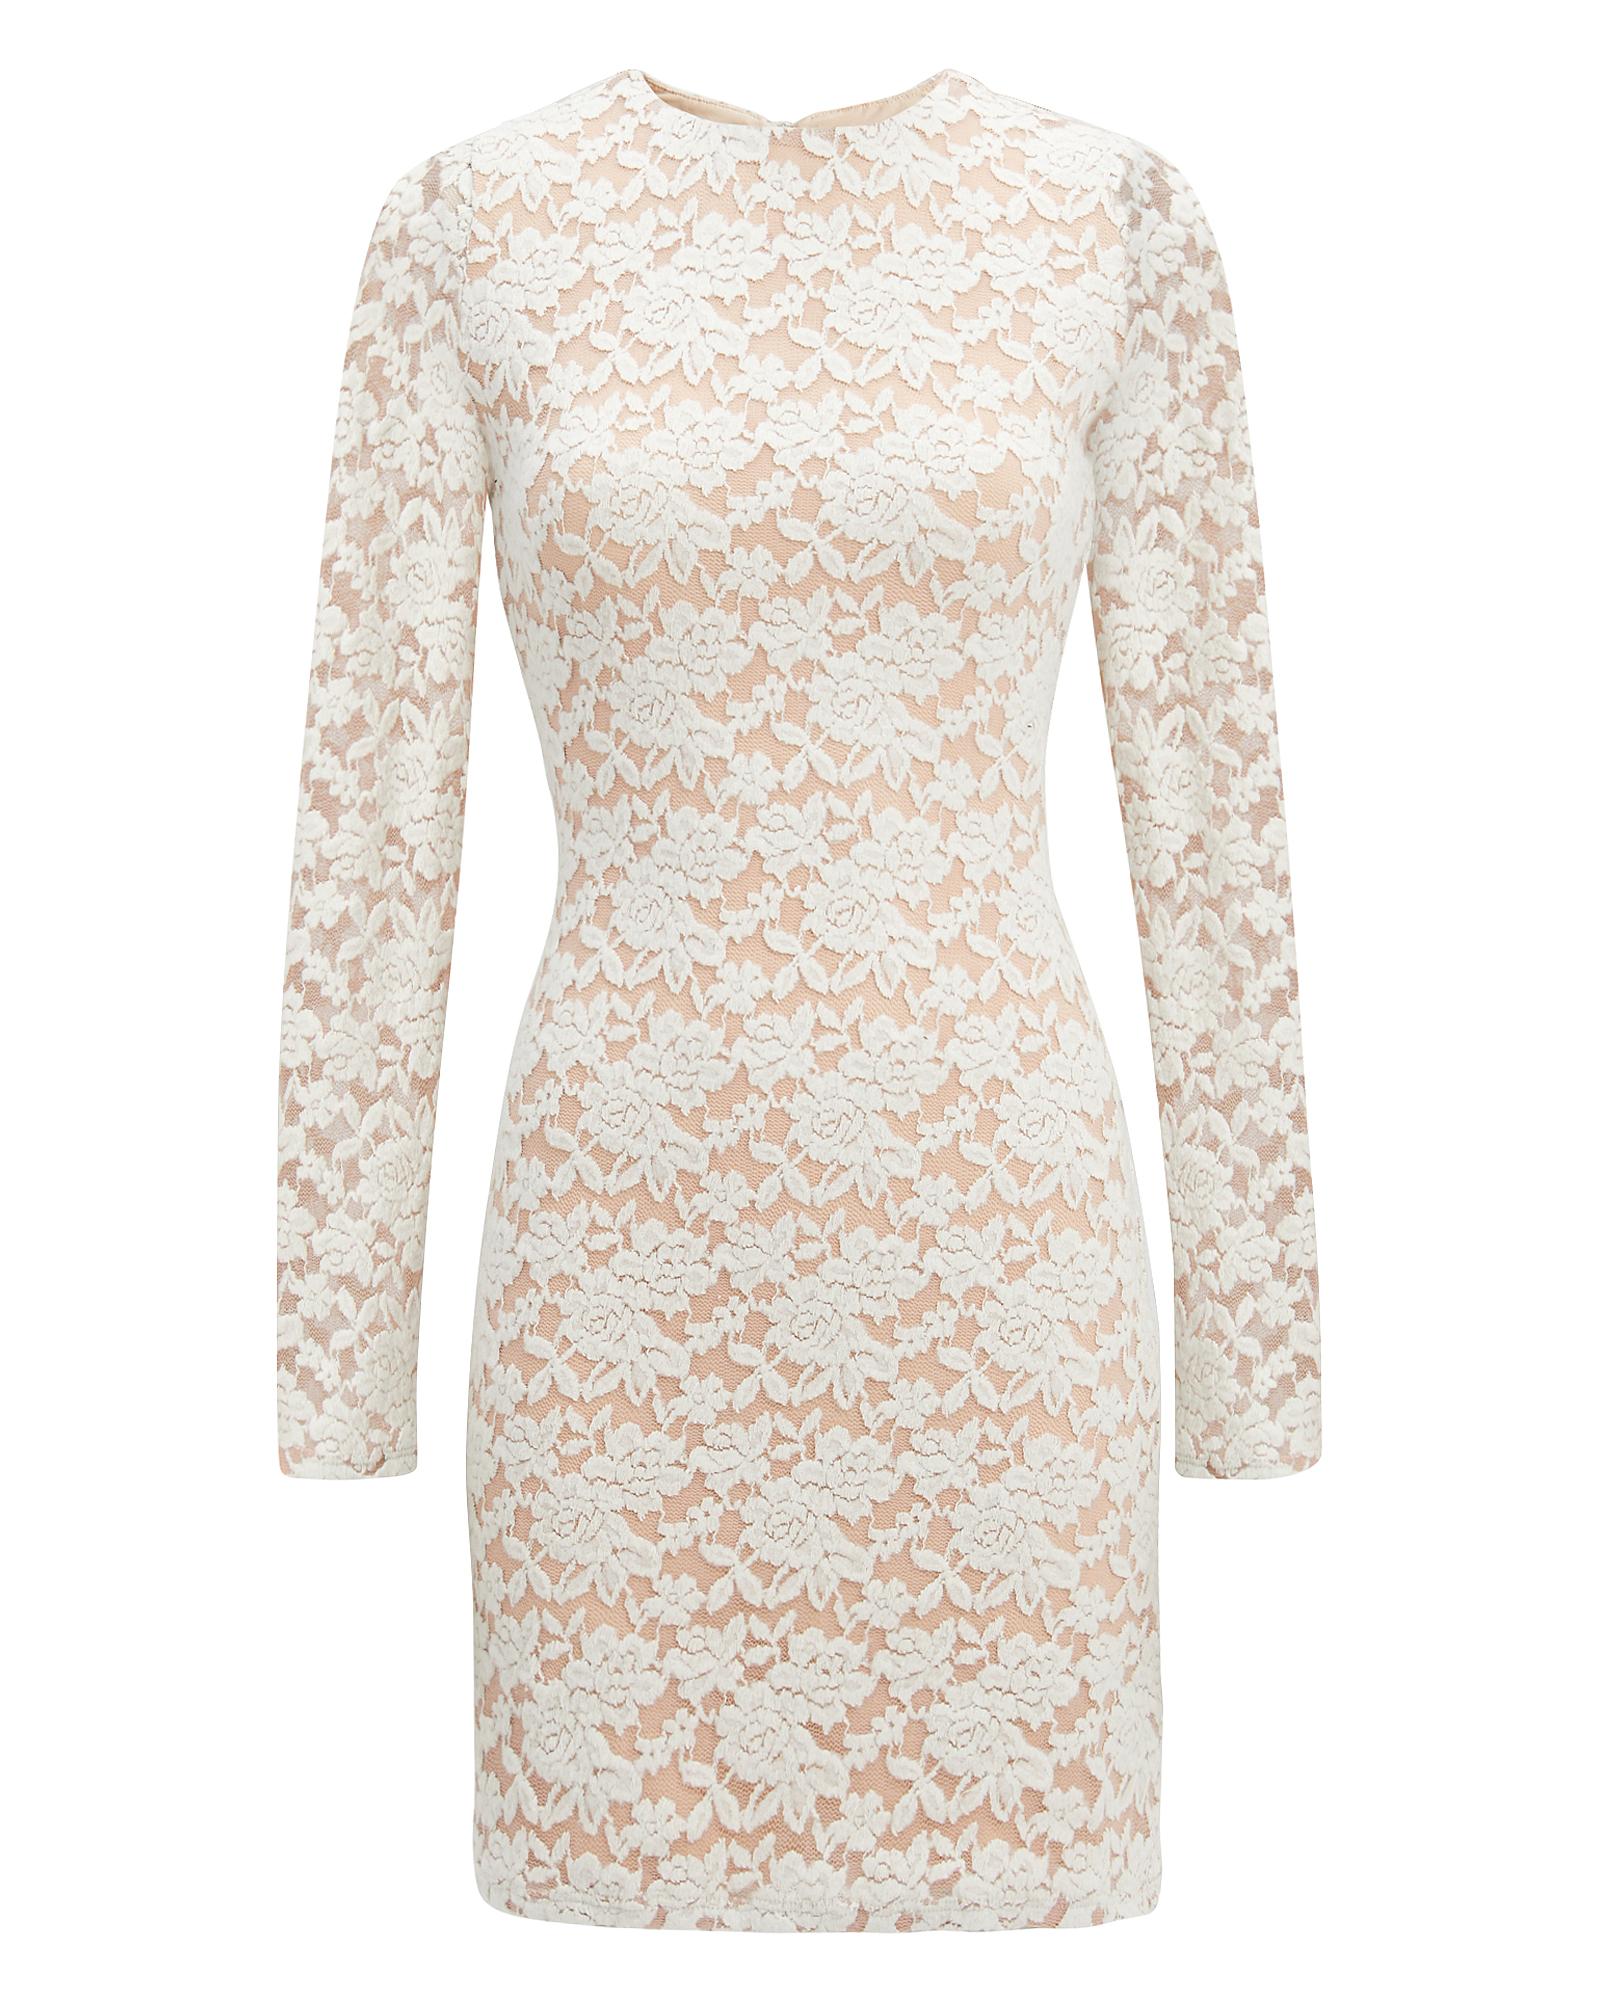 NIGHTCAP CLOTHING Ivory Sweater Lace Dress